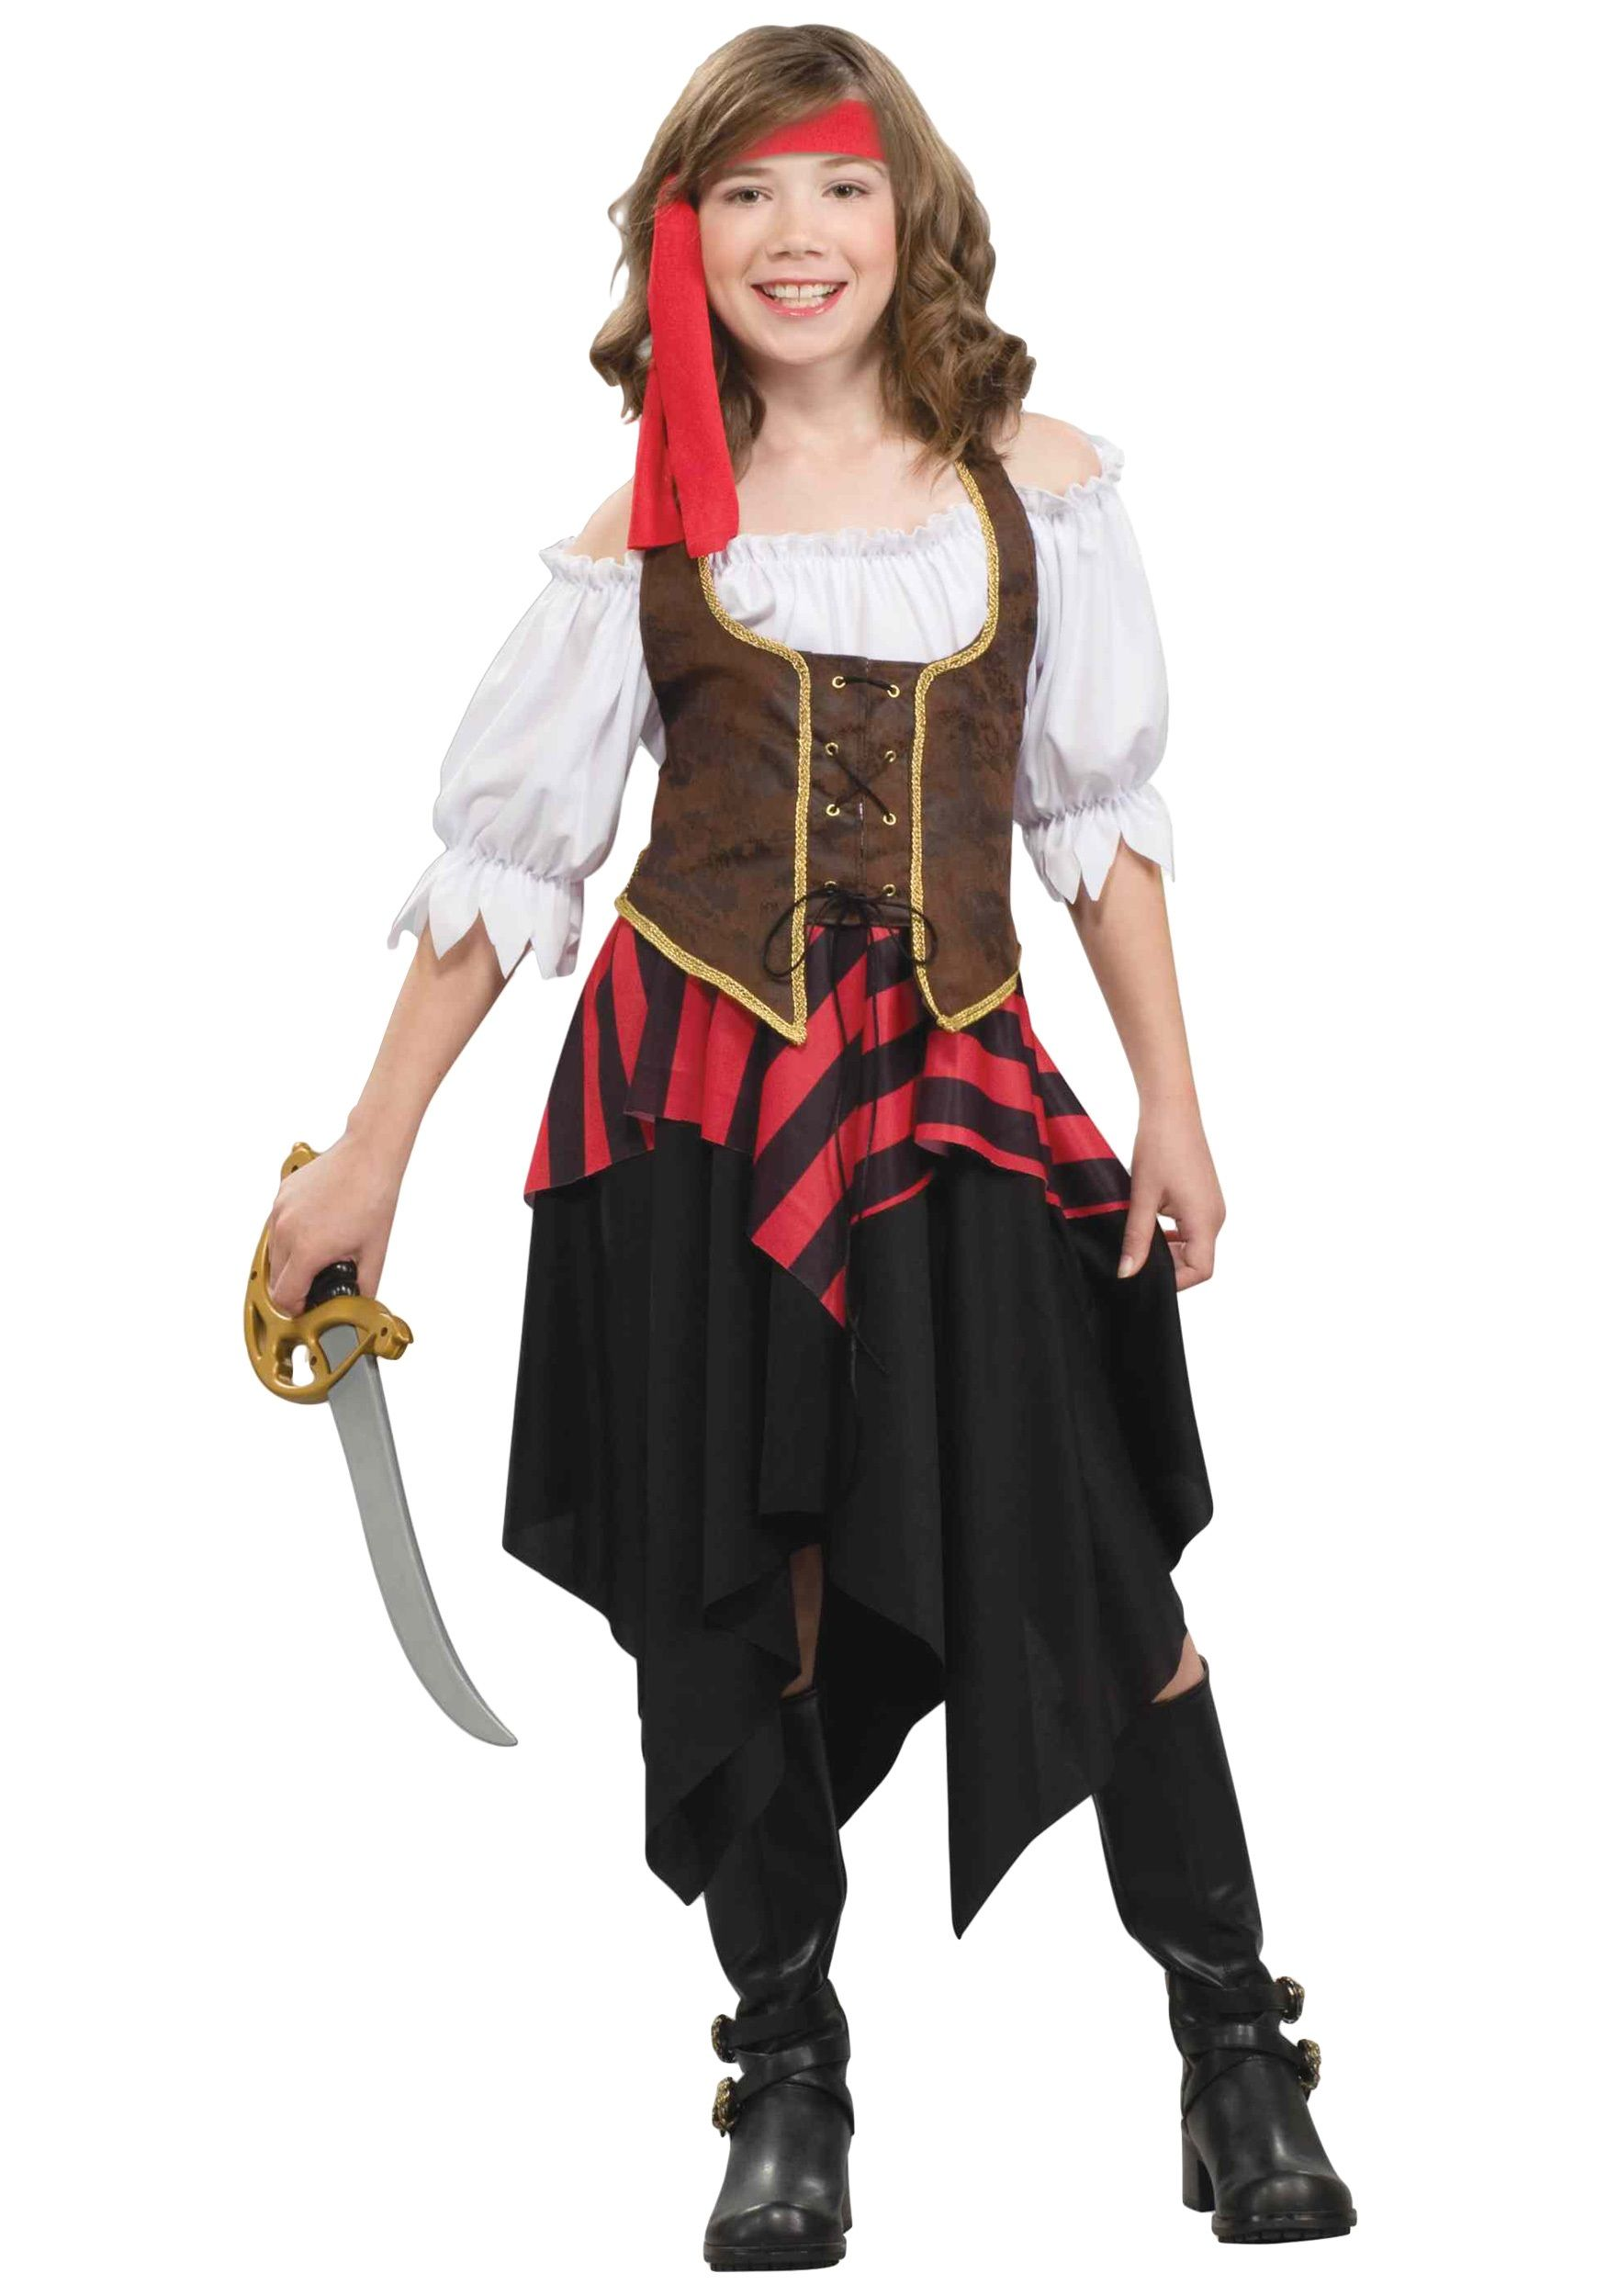 Sparrow Costume Jack Google Google Costume SearchPiraten Jack Sparrow drosxthQCB